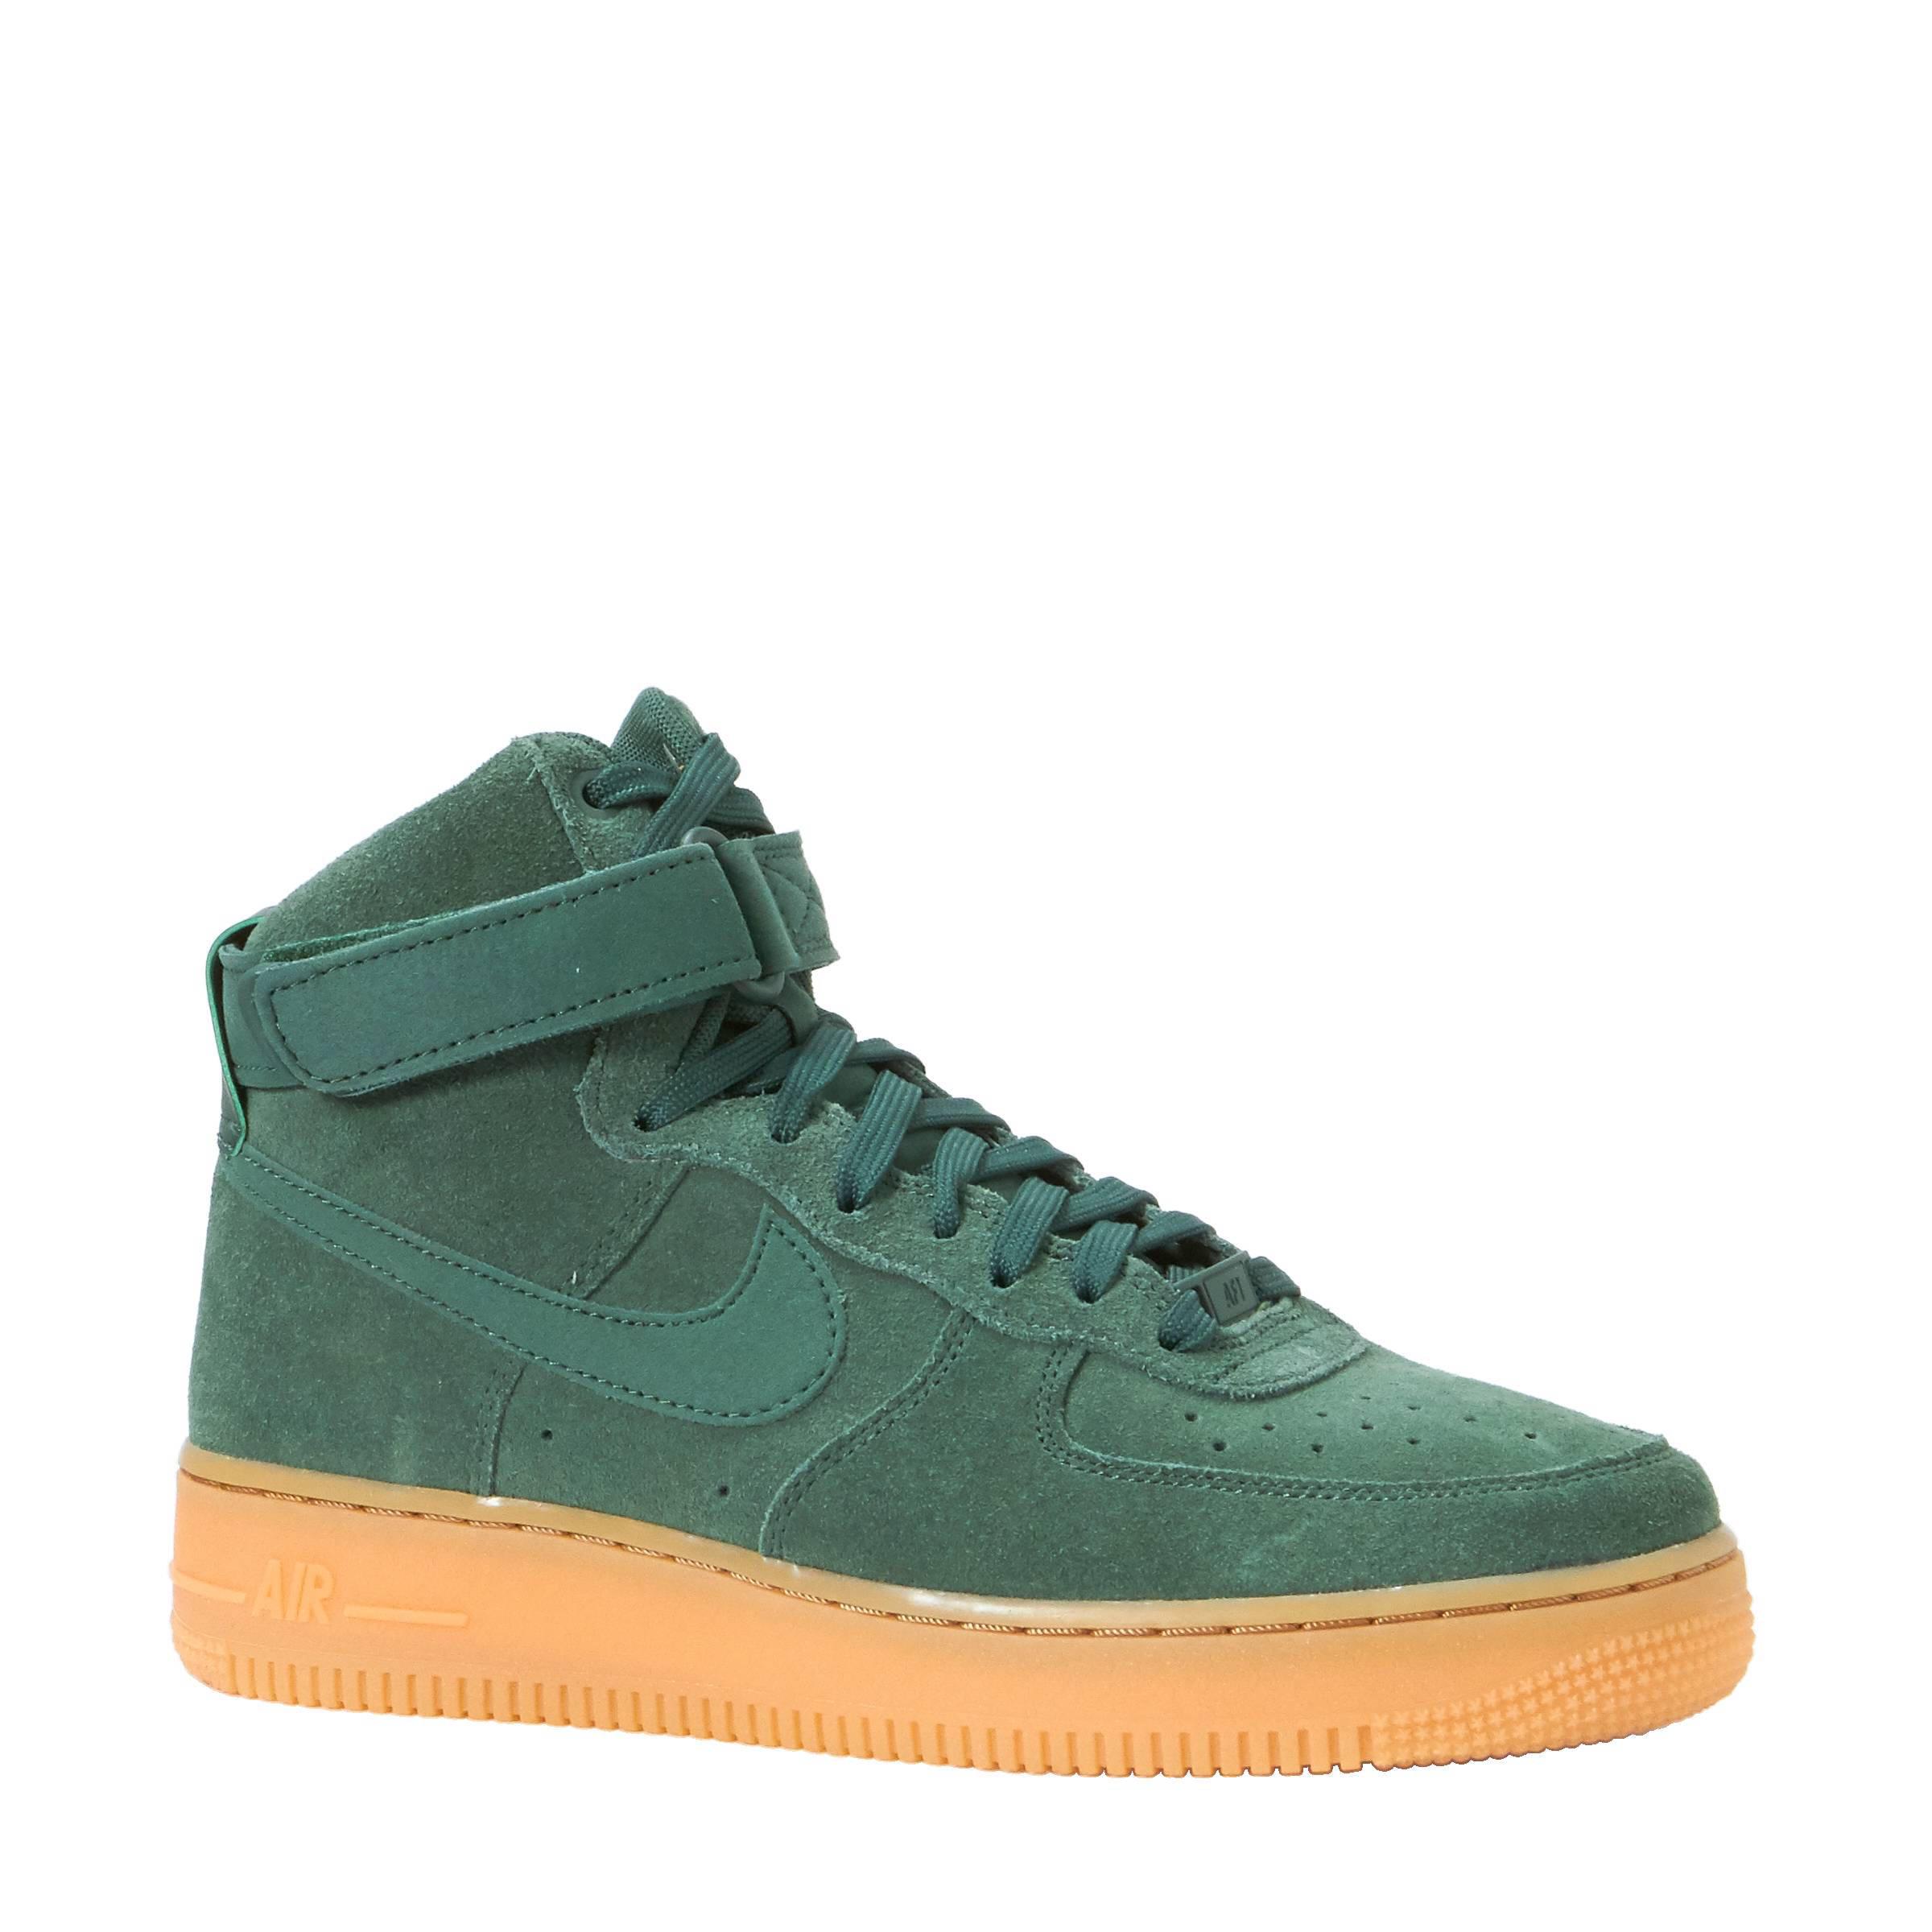 d2735a1033a nike-air-force-1-high-07-lv8-sneakers-donkergroen-0823233288423.jpg